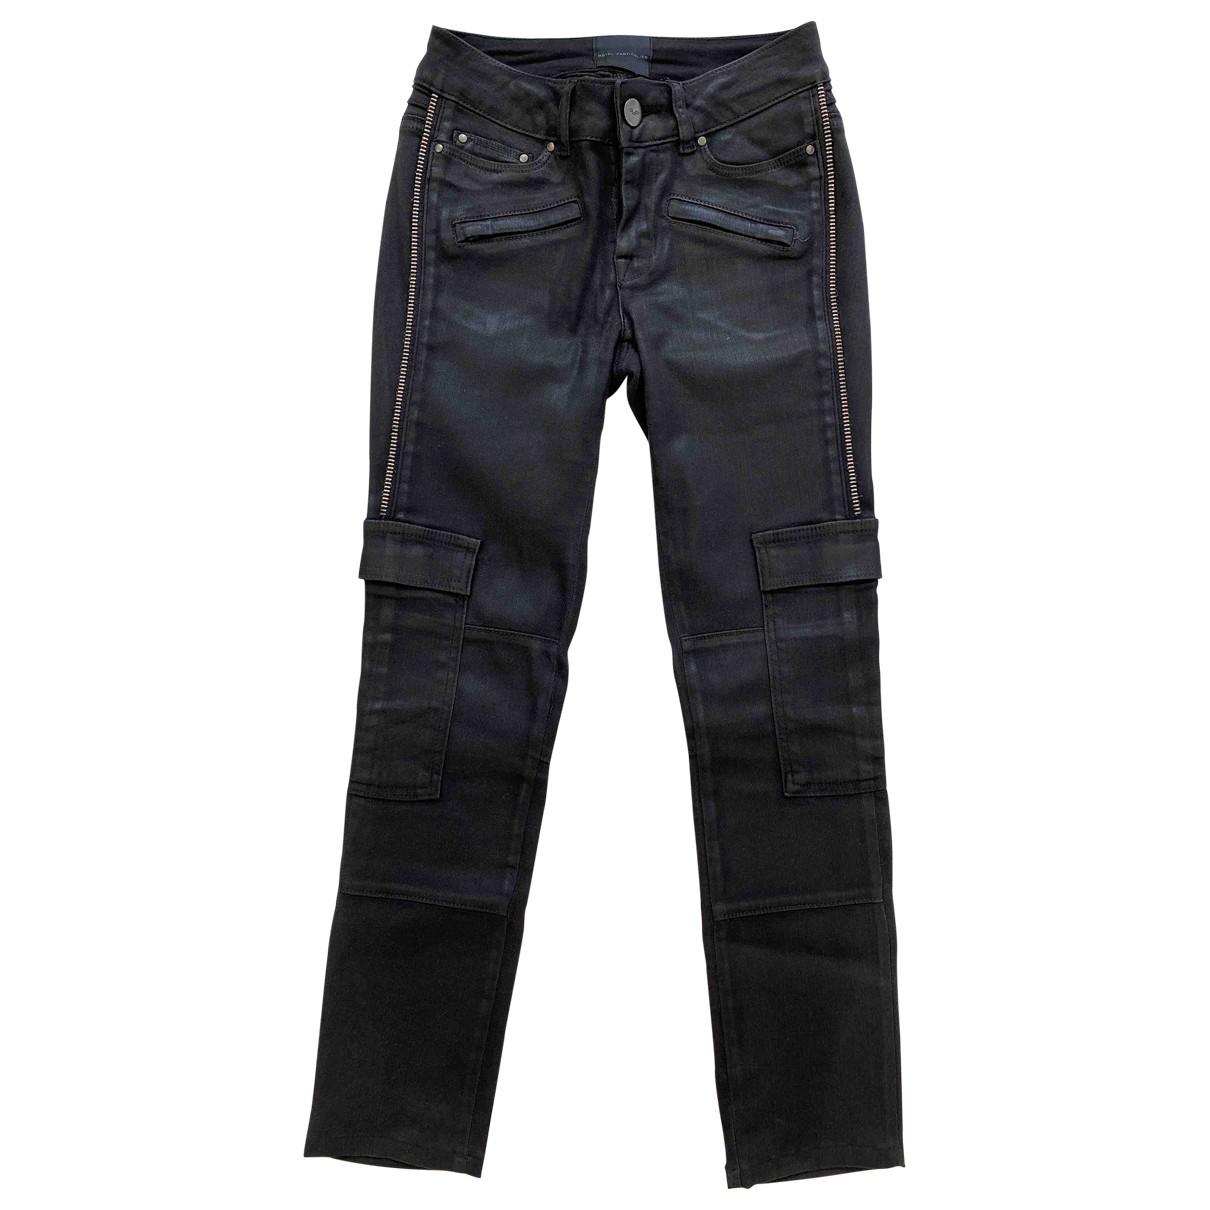 Hôtel Particulier \N Black Cotton - elasthane Jeans for Women 25 US